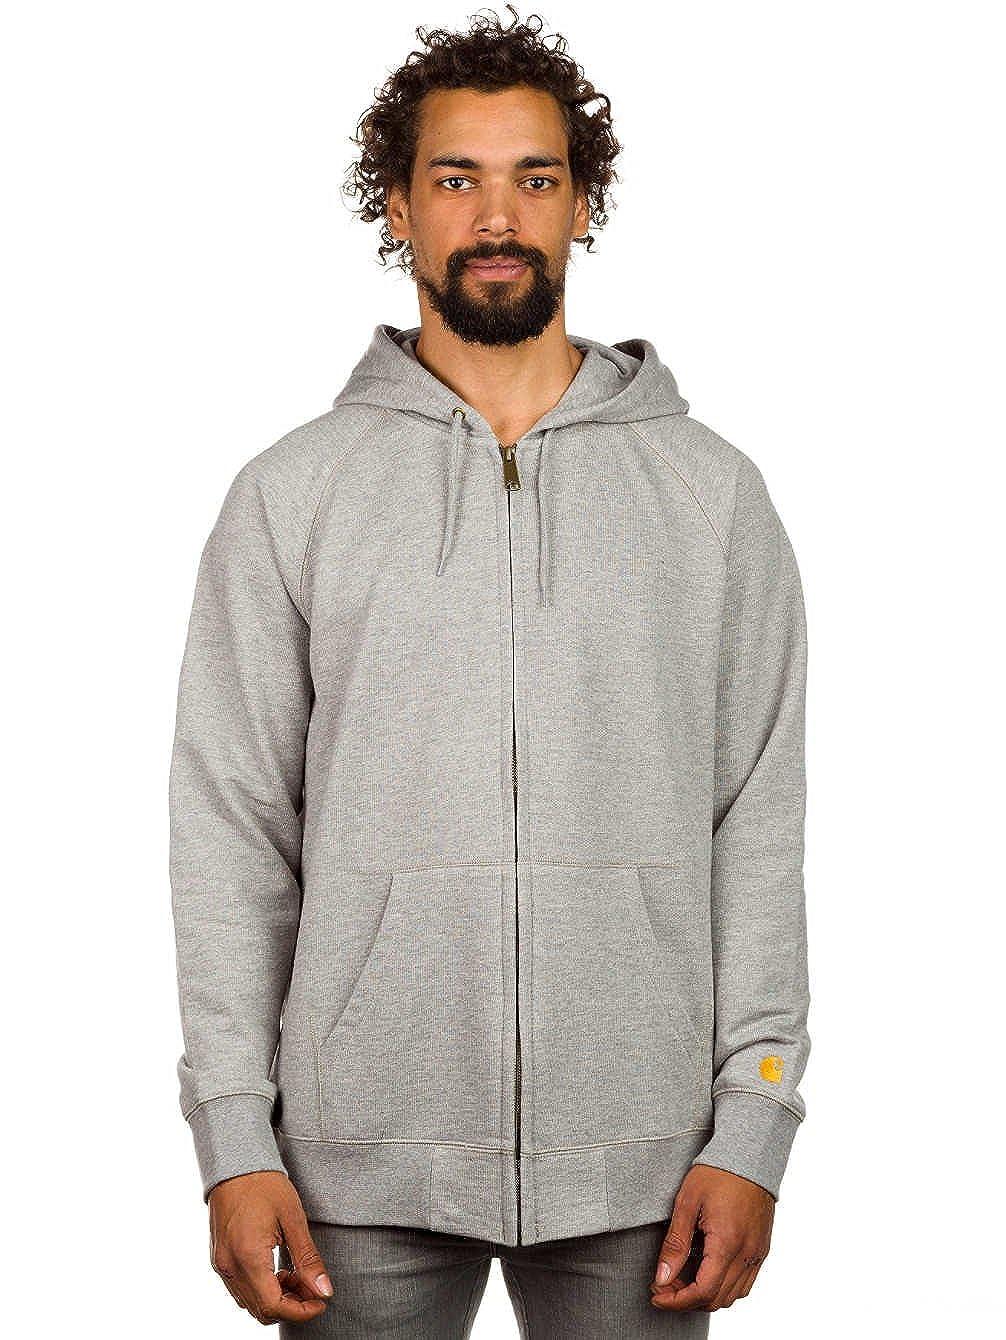 Carhartt Sudaderas - Carhartt Hooded Chase Jacket... gris extra-small: Amazon.es: Ropa y accesorios